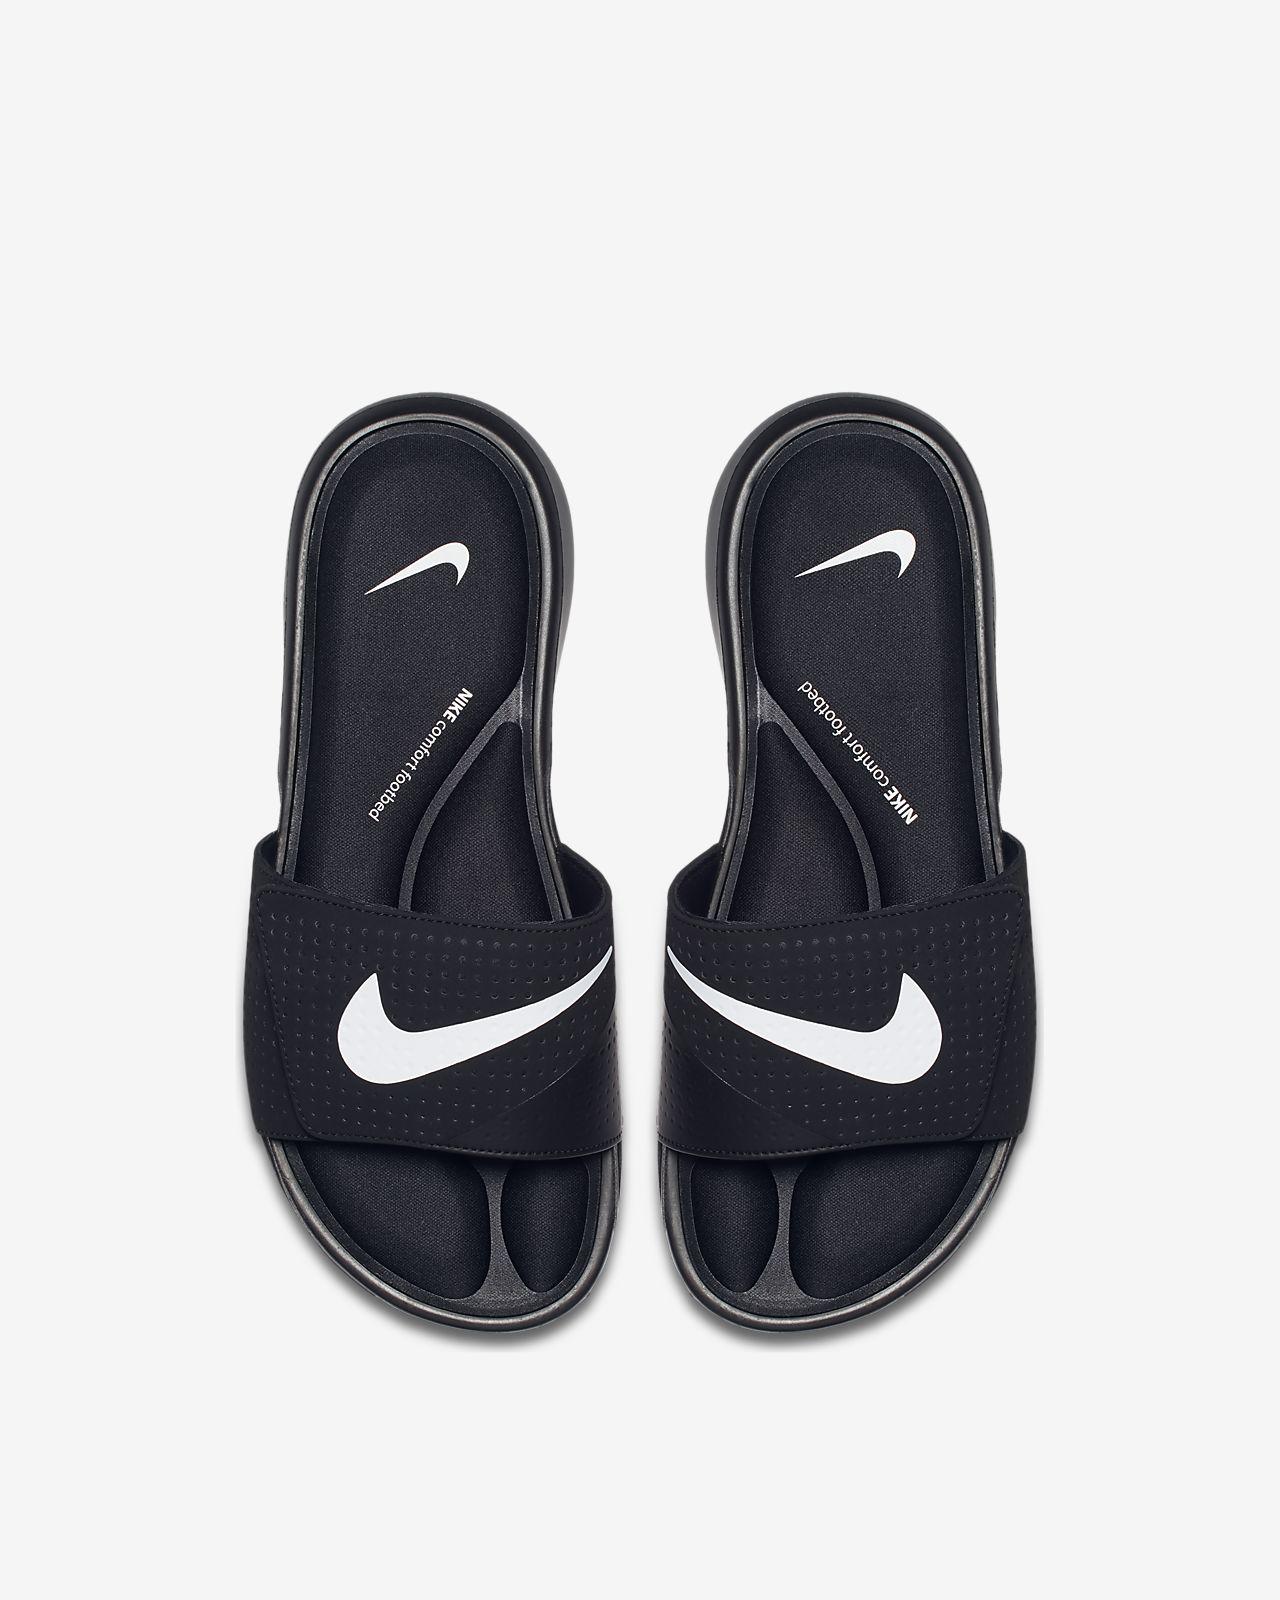 bb2da5624e18 Nike Ultra Comfort Men s Slide. Nike.com